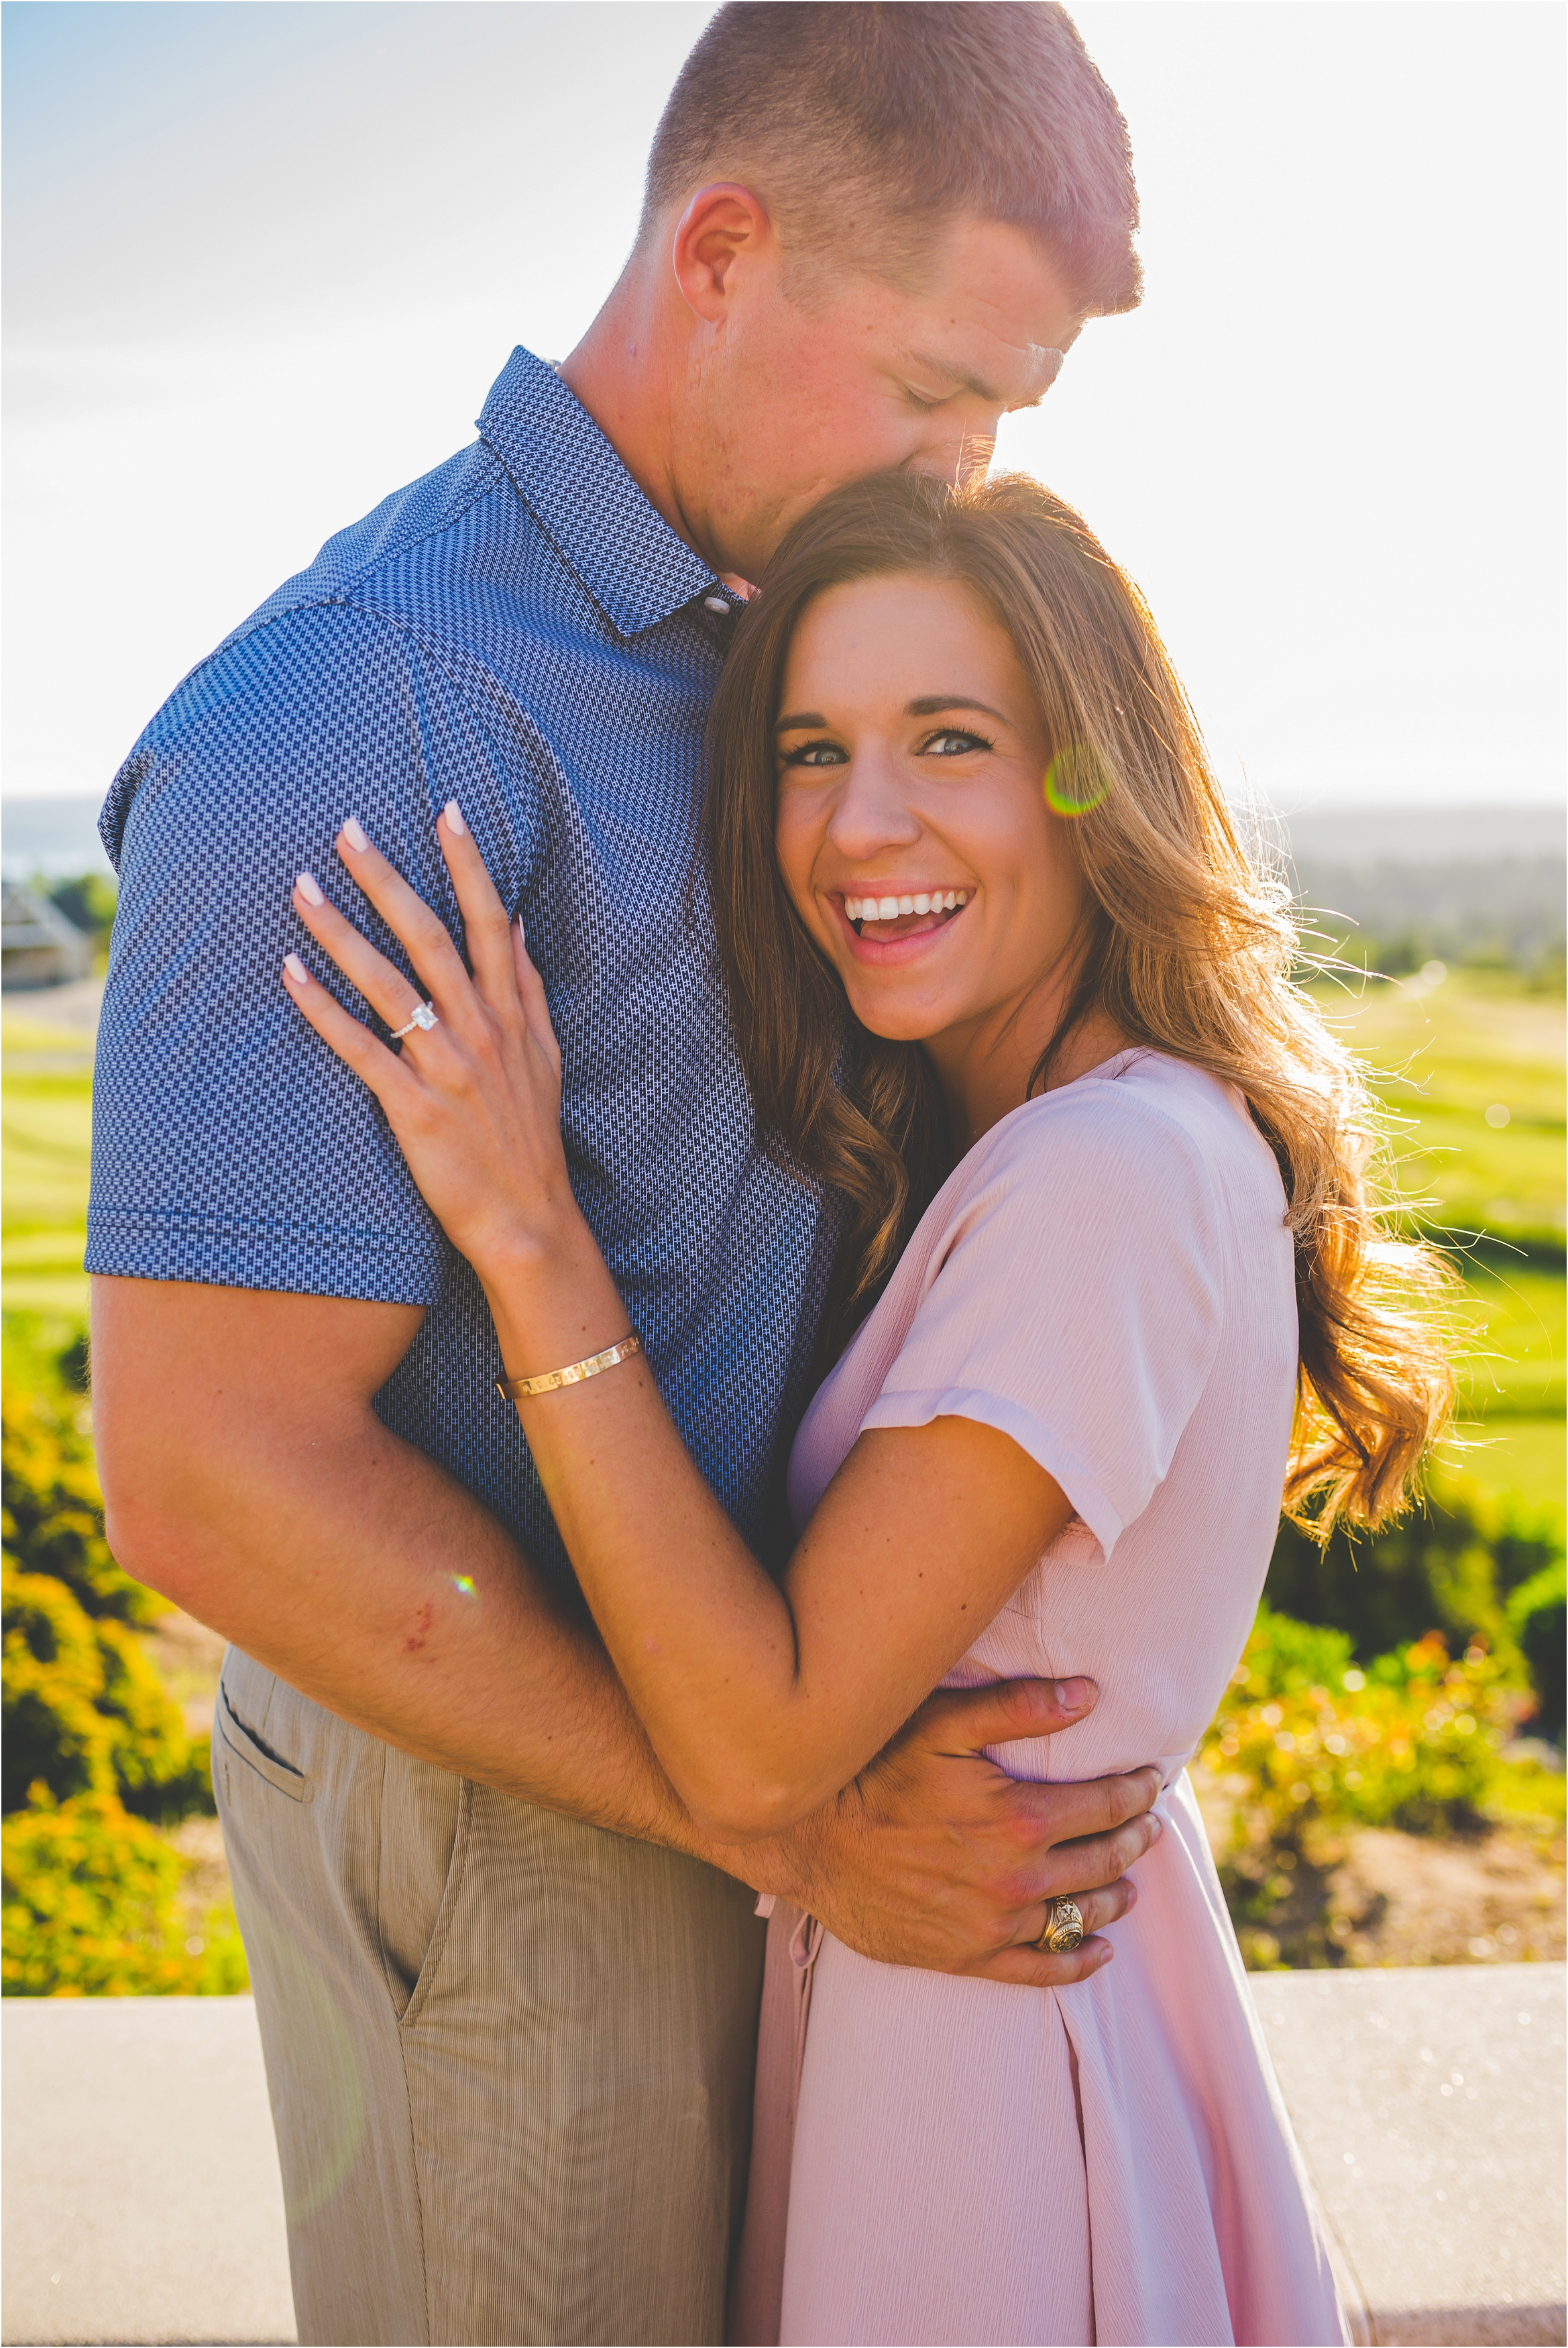 newcastle-golf-club-proposal-jannicka-mayte-seattle-washington-engagement-wedding-photographer_0034.jpg